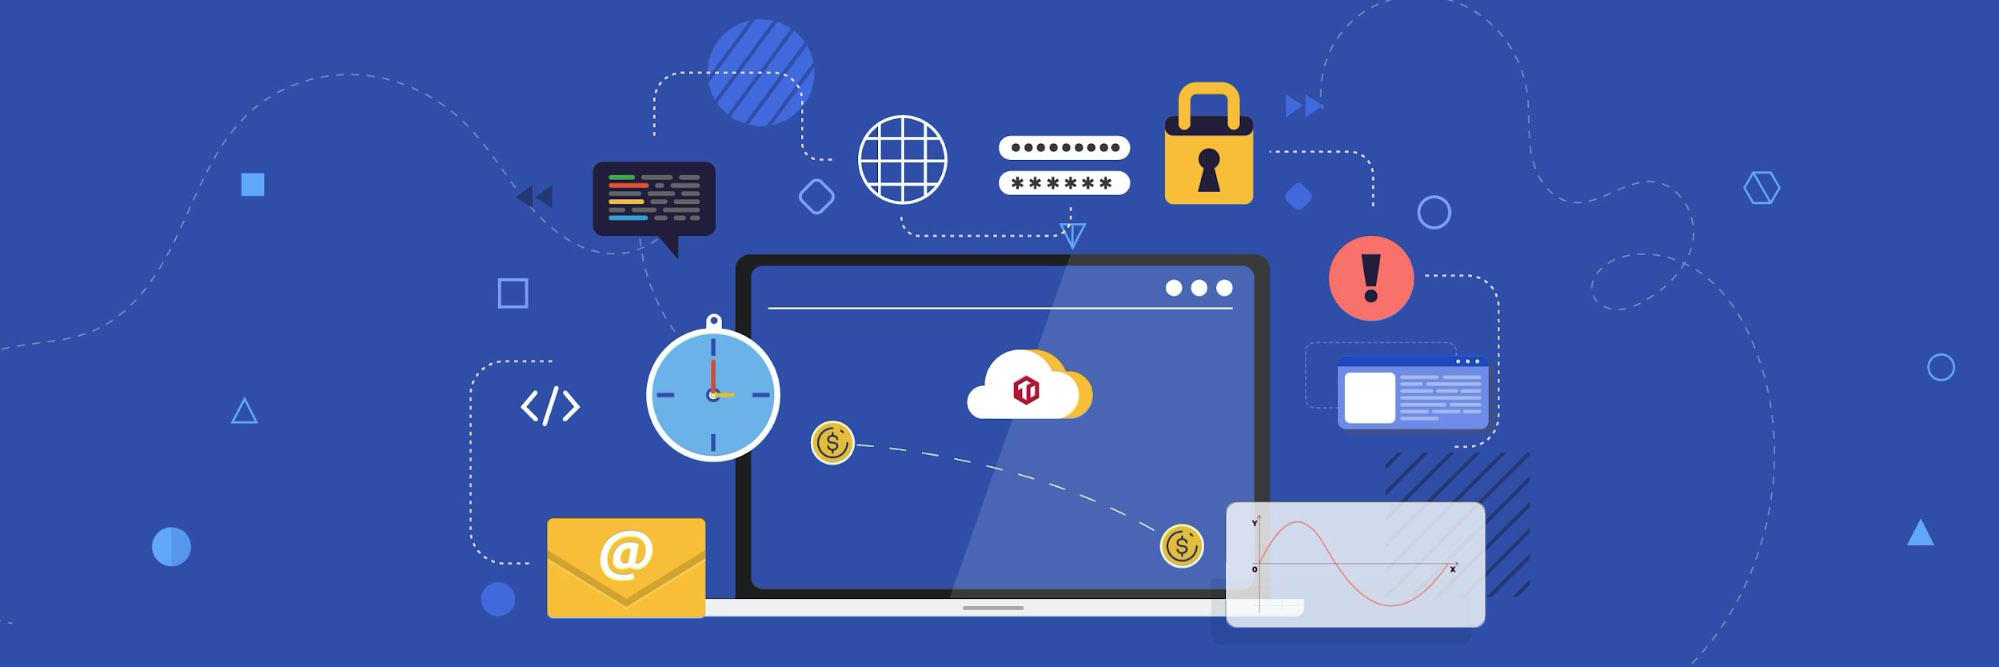 TiDB Hackathon: Reducing Cross-AZ Data Transfer Costs by 89%